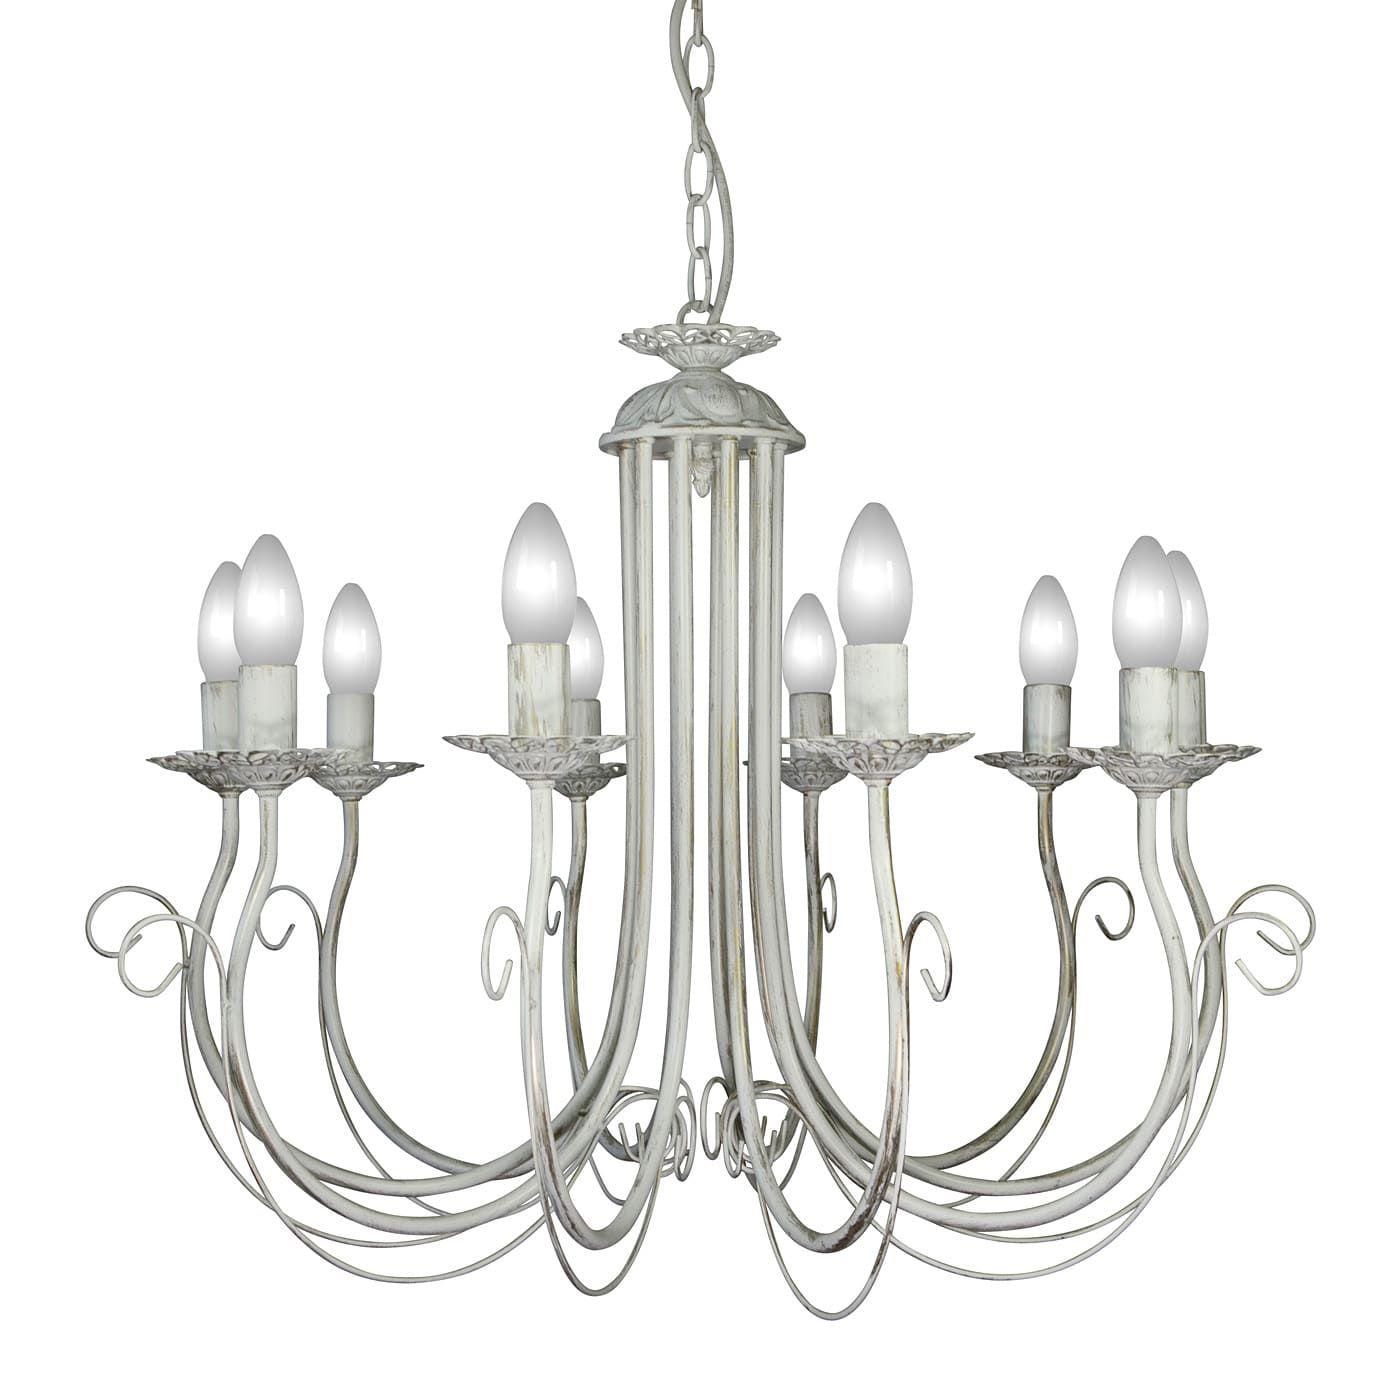 PETRASVET / Pendant chandelier S1166-10, 10xE14 max. 60W